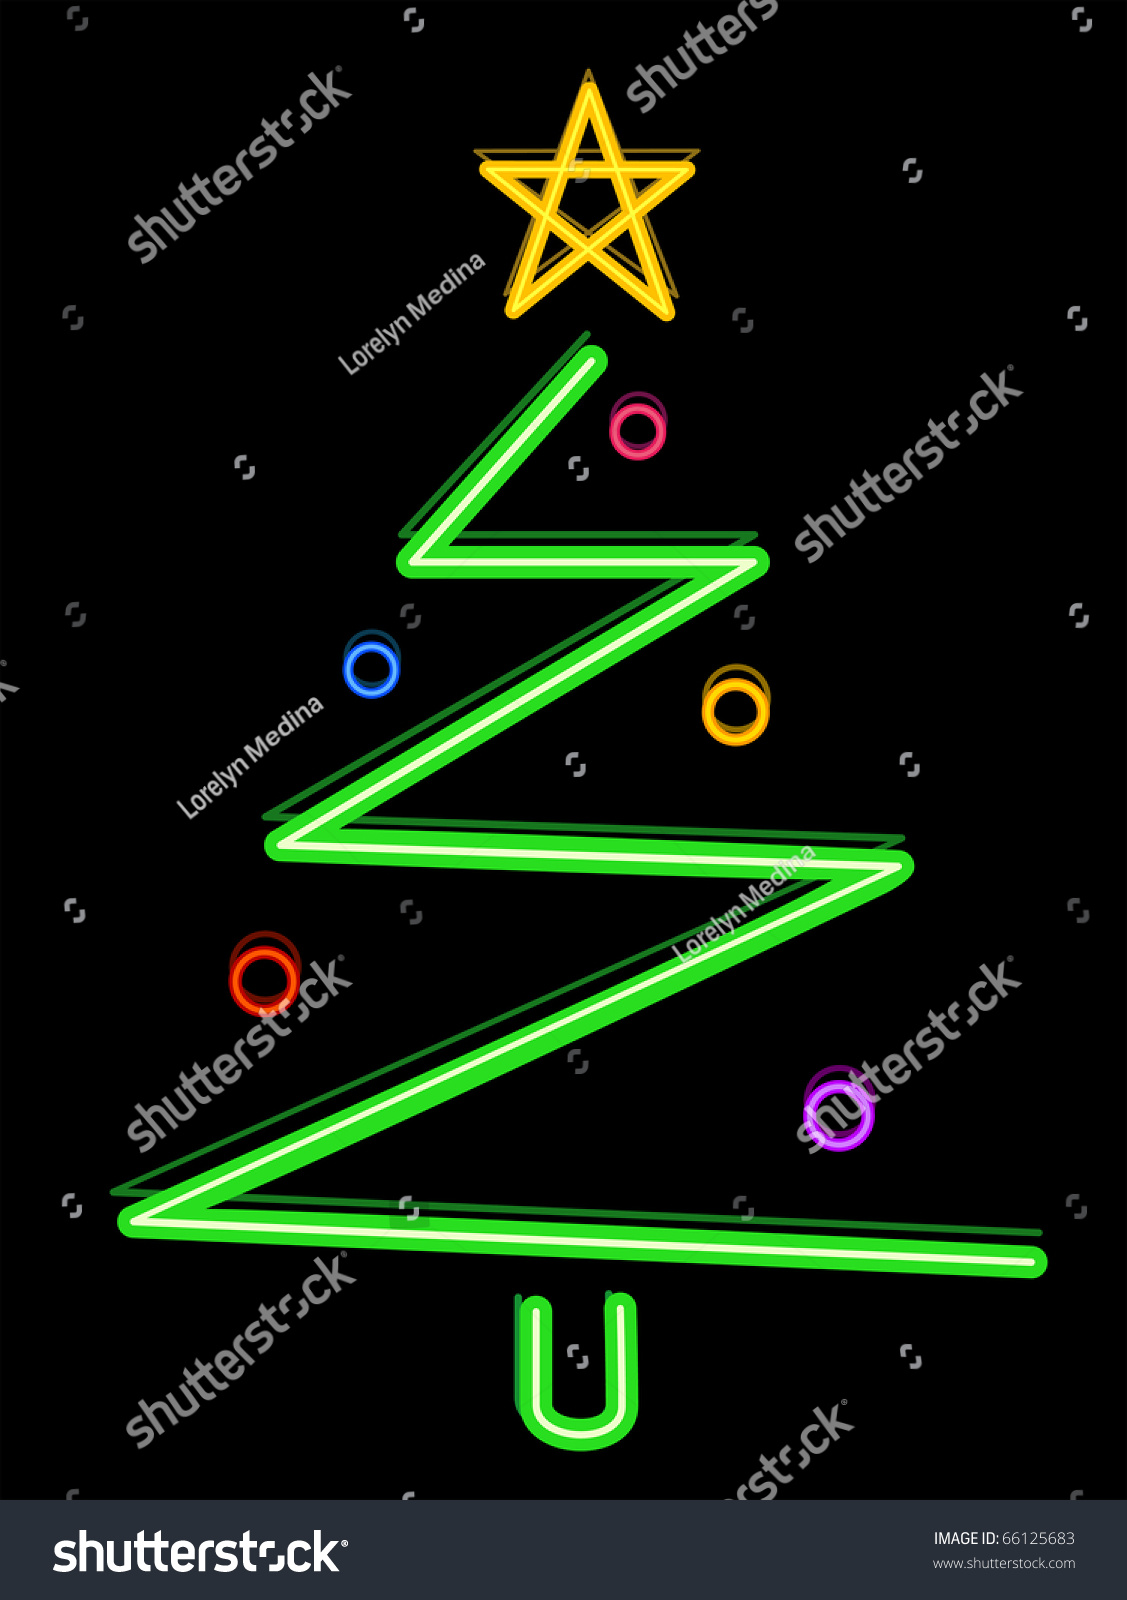 Christmas Tree Design Featuring Neon Lights Stock Vector 66125683  - Christmas Tree Shaped Lights